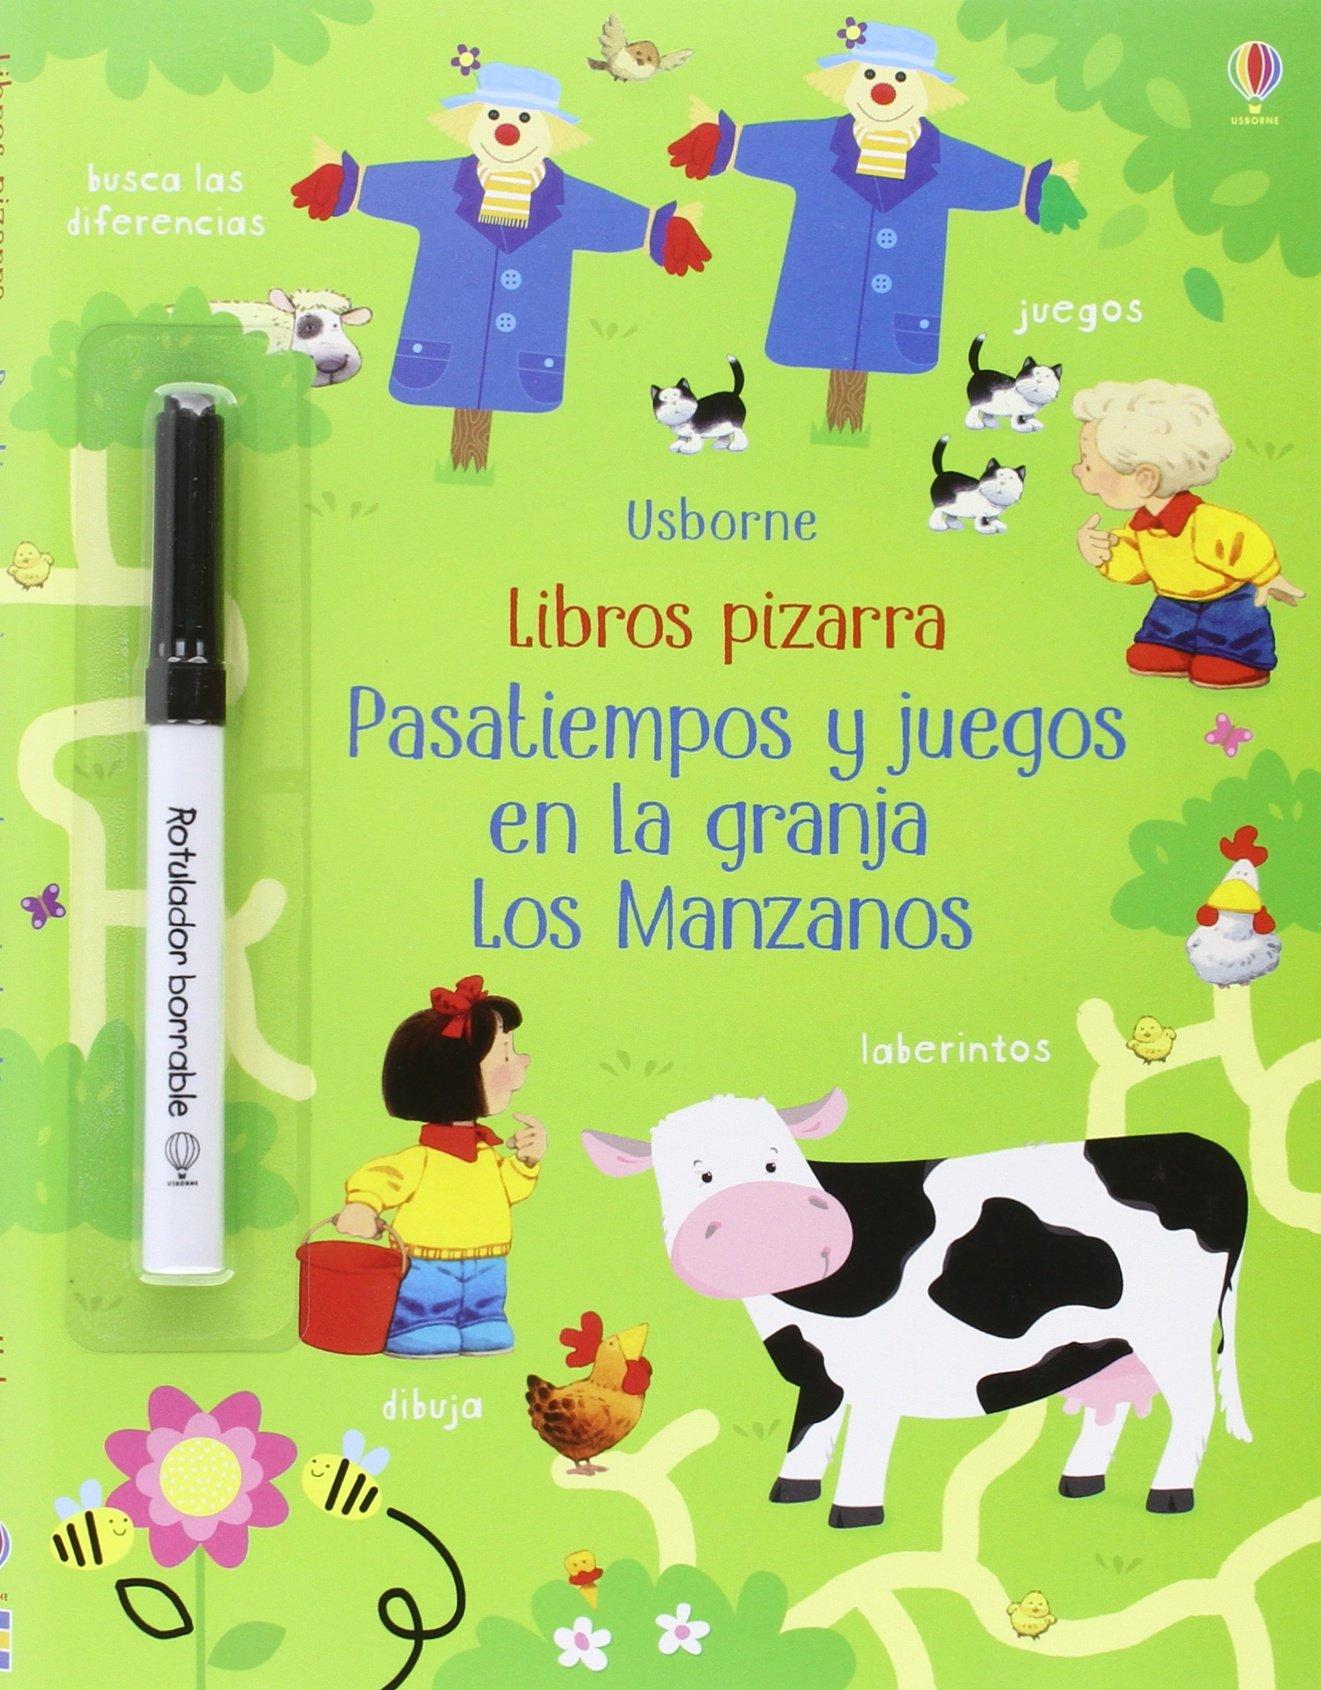 LA GRANJA GRAN LIBRO PIZARRA: ROBSON KIRSTEEN: 9781474920025 ...